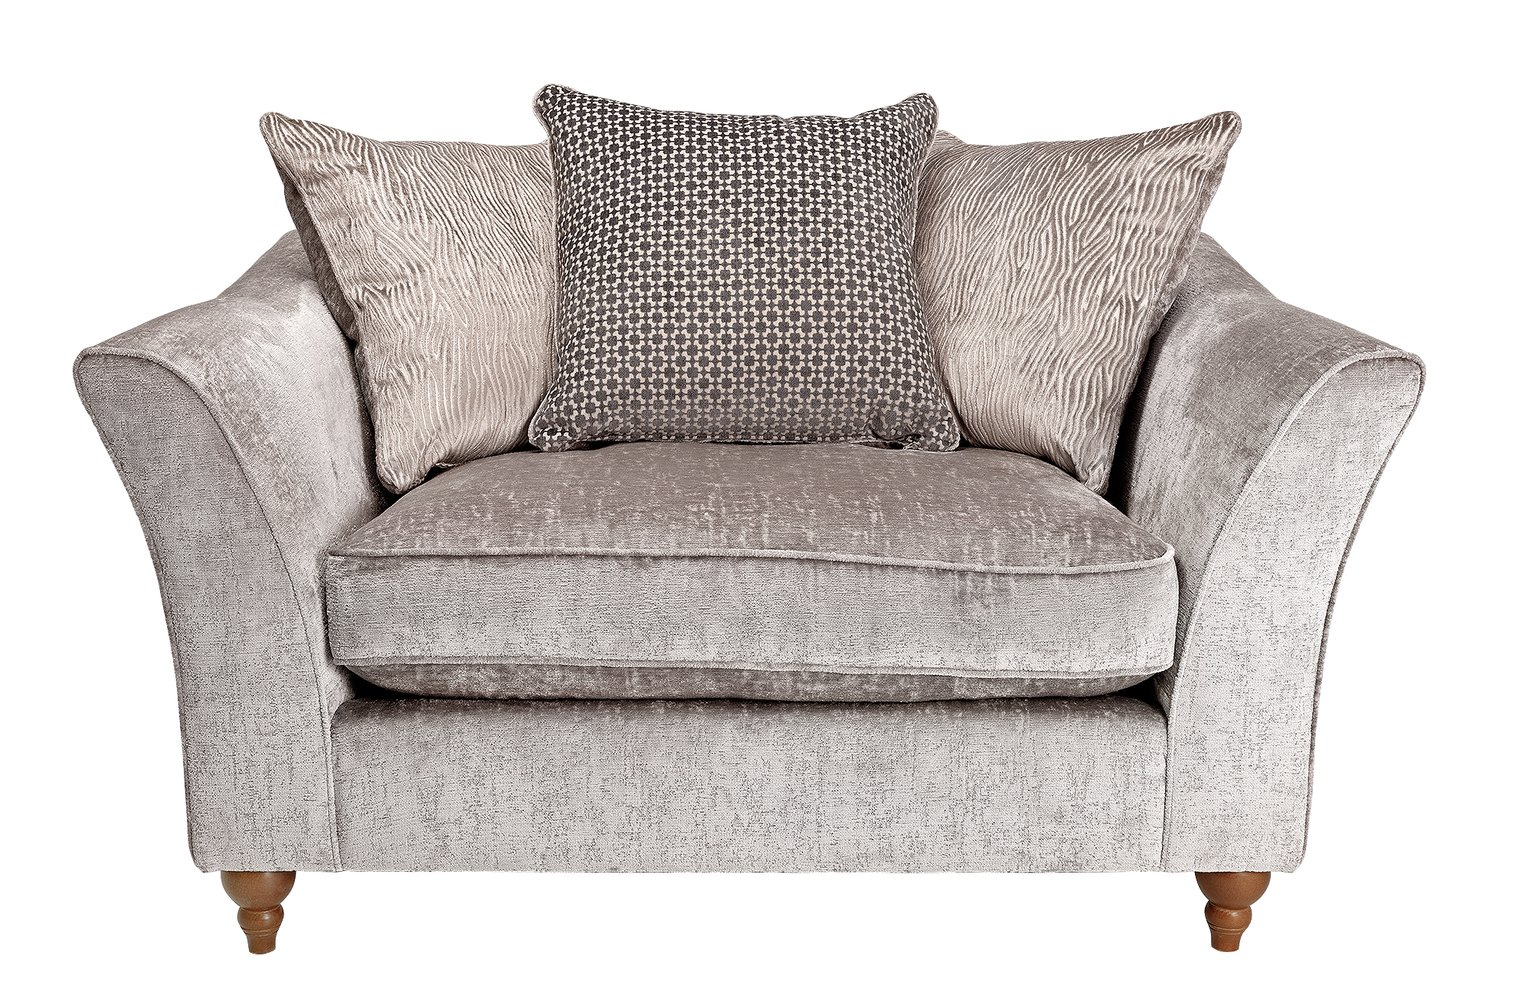 Argos Home Buxton Fabric Cuddle Chair - Truffle